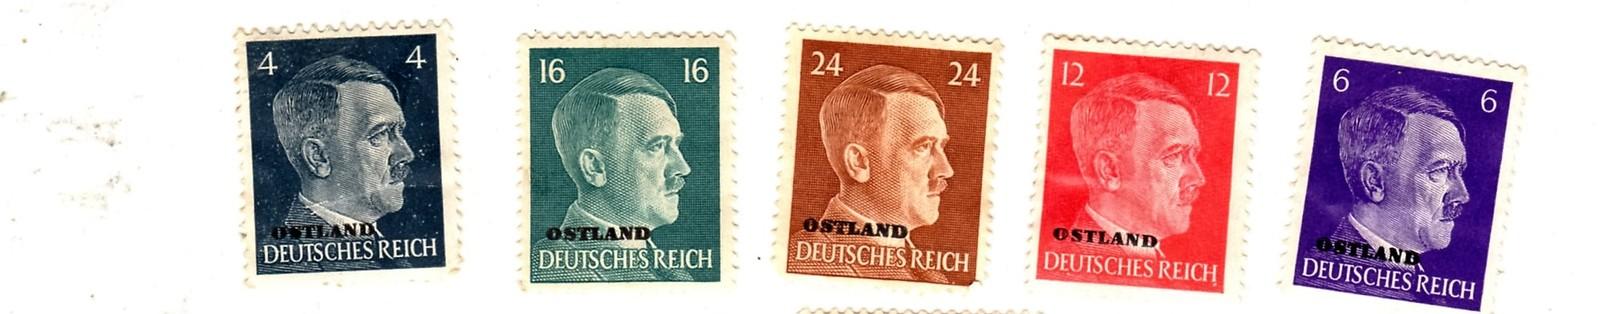 Stamps - Germany- European Postage -Germany (25 vintage stamps) image 6